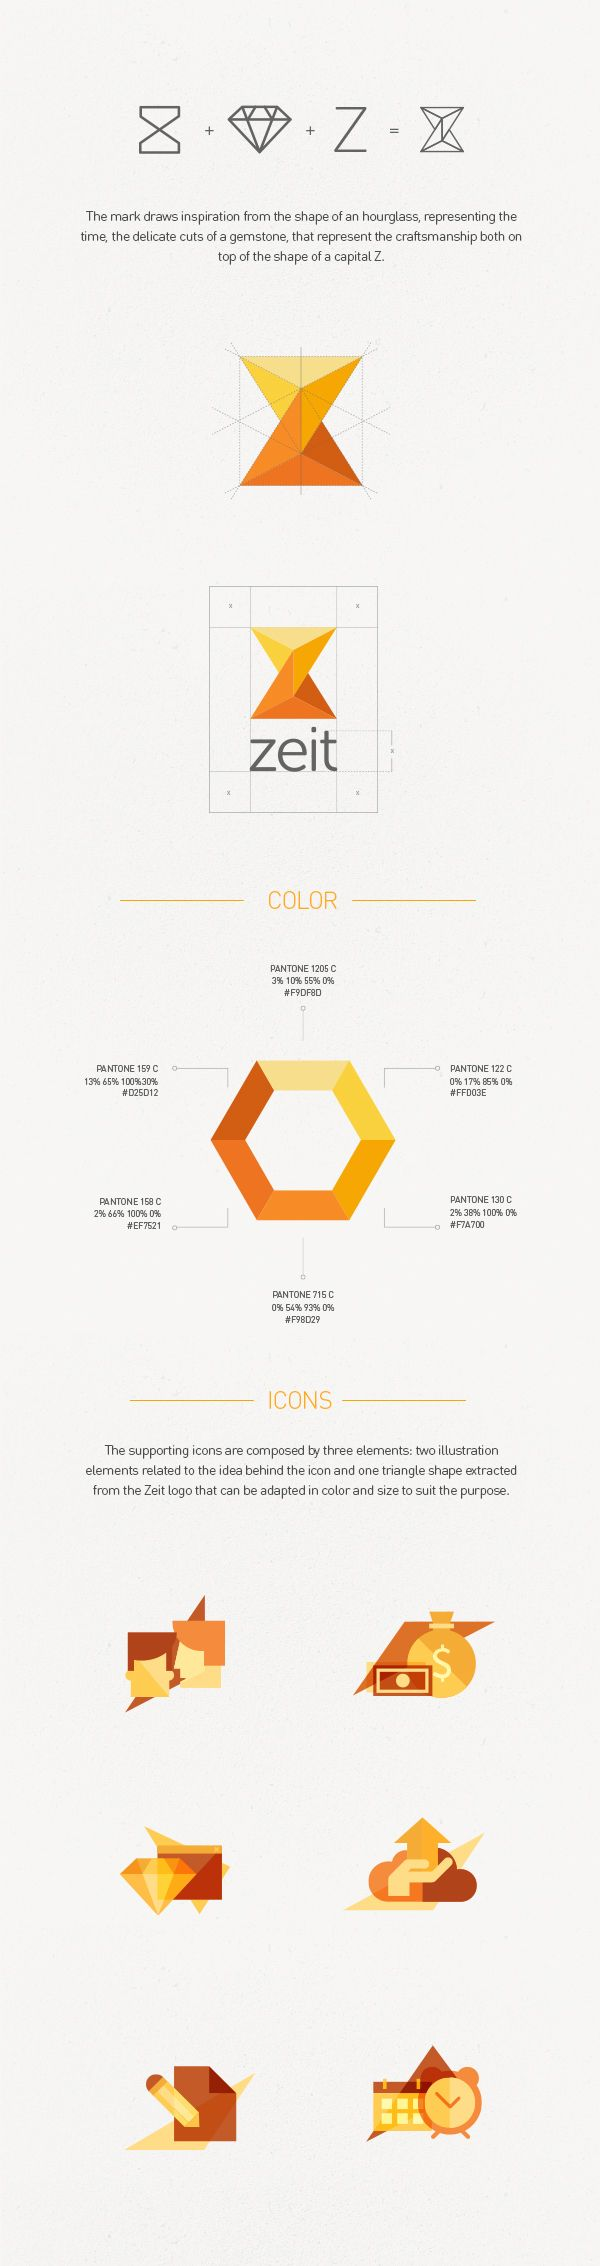 ZEIT | #corporate #branding #creative #logo #personalized #identity #design…